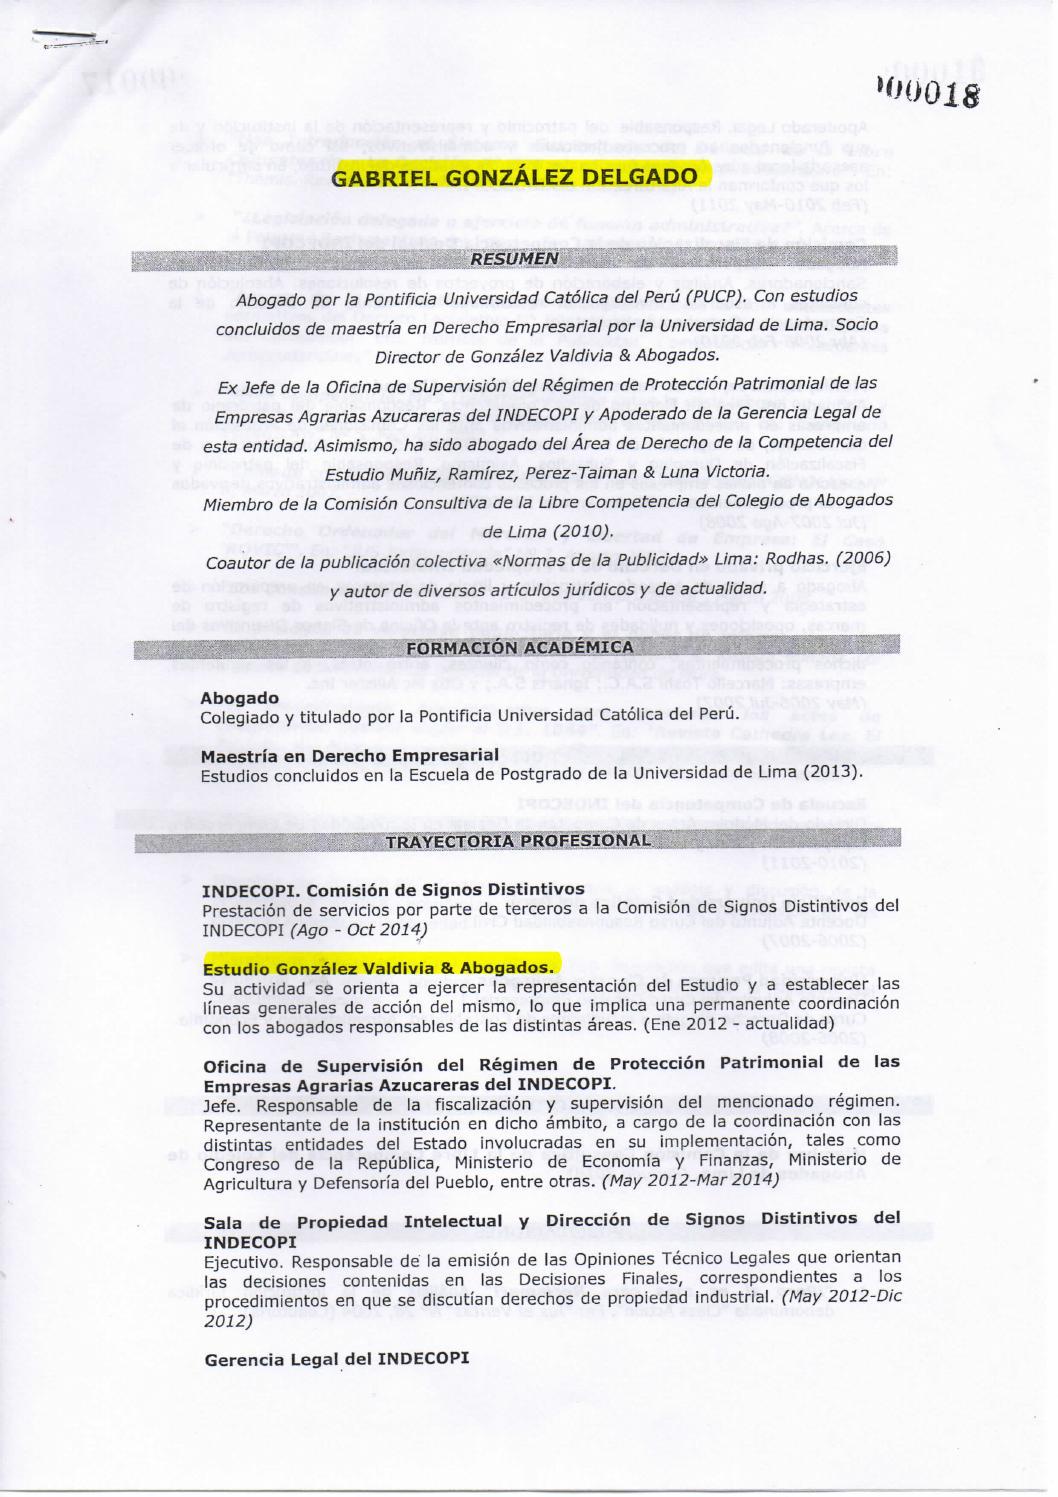 HOJAS DE VIDA DE ABOGADOS EXTERNOS PRIVADOS CONTRATADOS POR ...